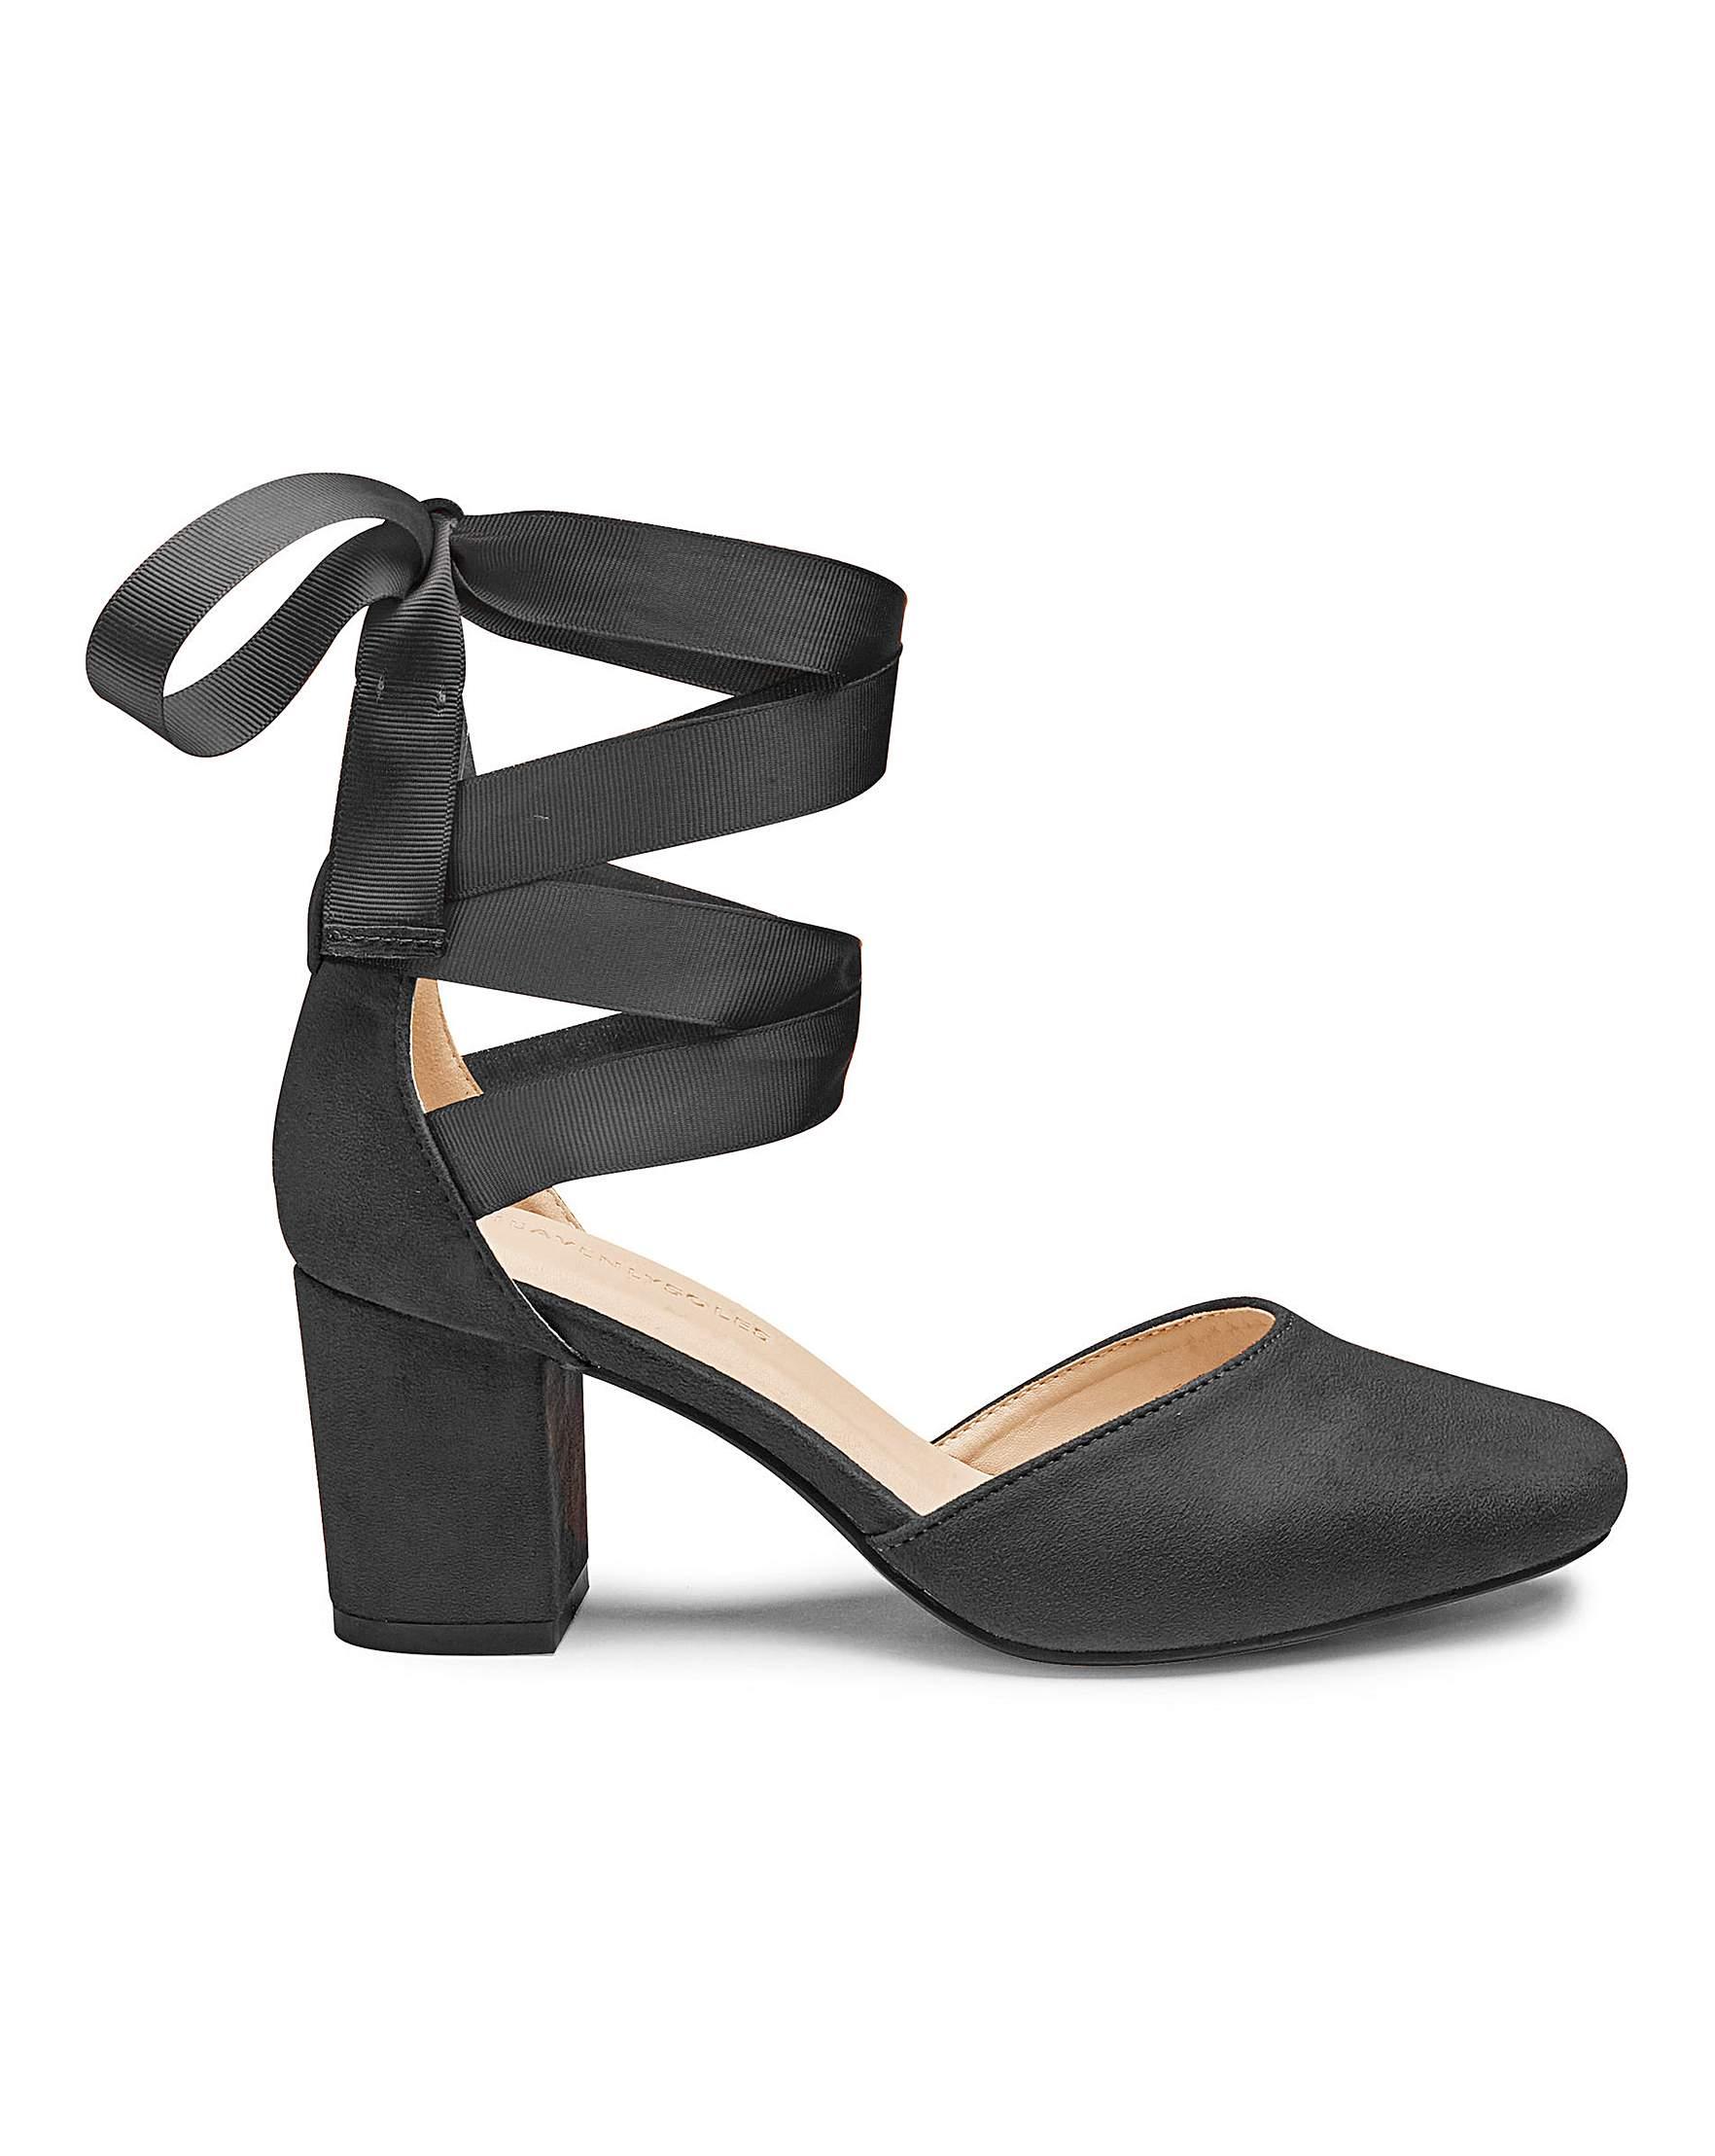 45b9704243c Heavenly Soles Leg Tie Shoes EEE Fit